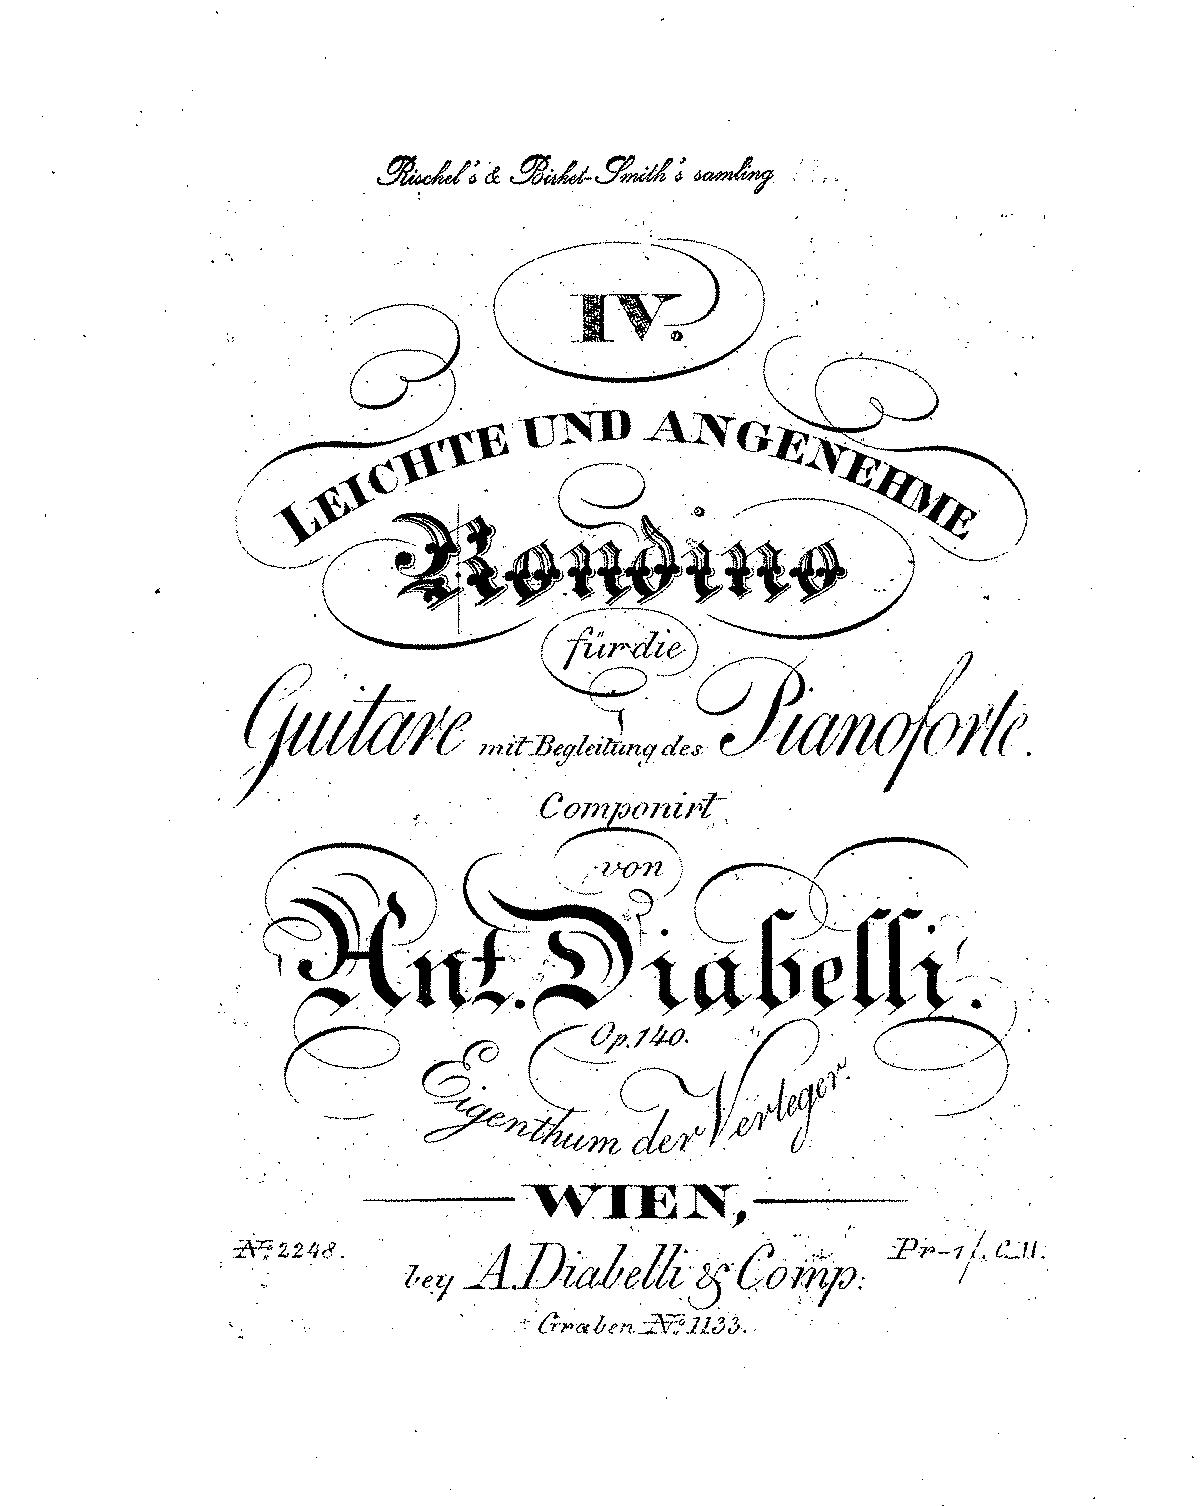 4 Leichte und angenehme Rondino, Op.140 (Diabelli, Anton